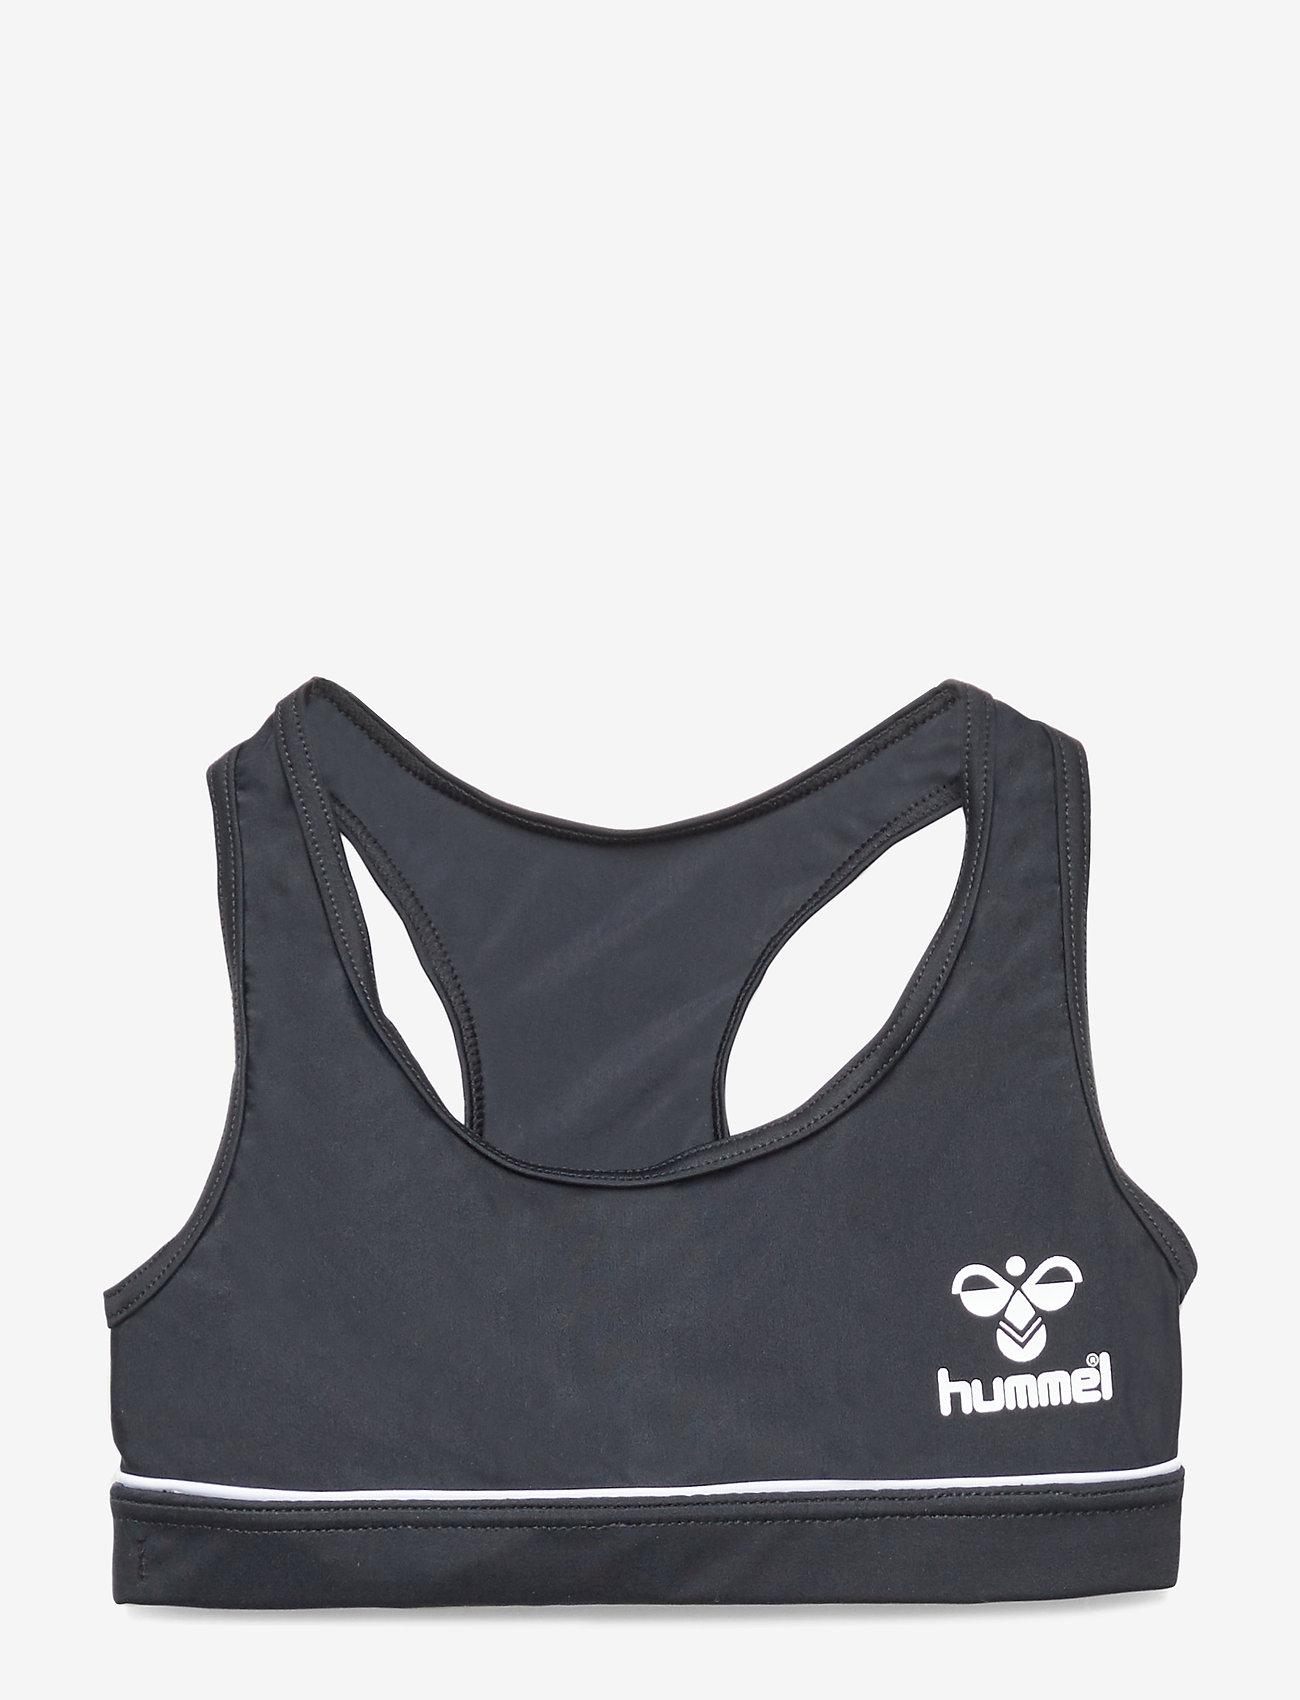 Hummel - MEDINE BIKINI TOP - bikinis - black